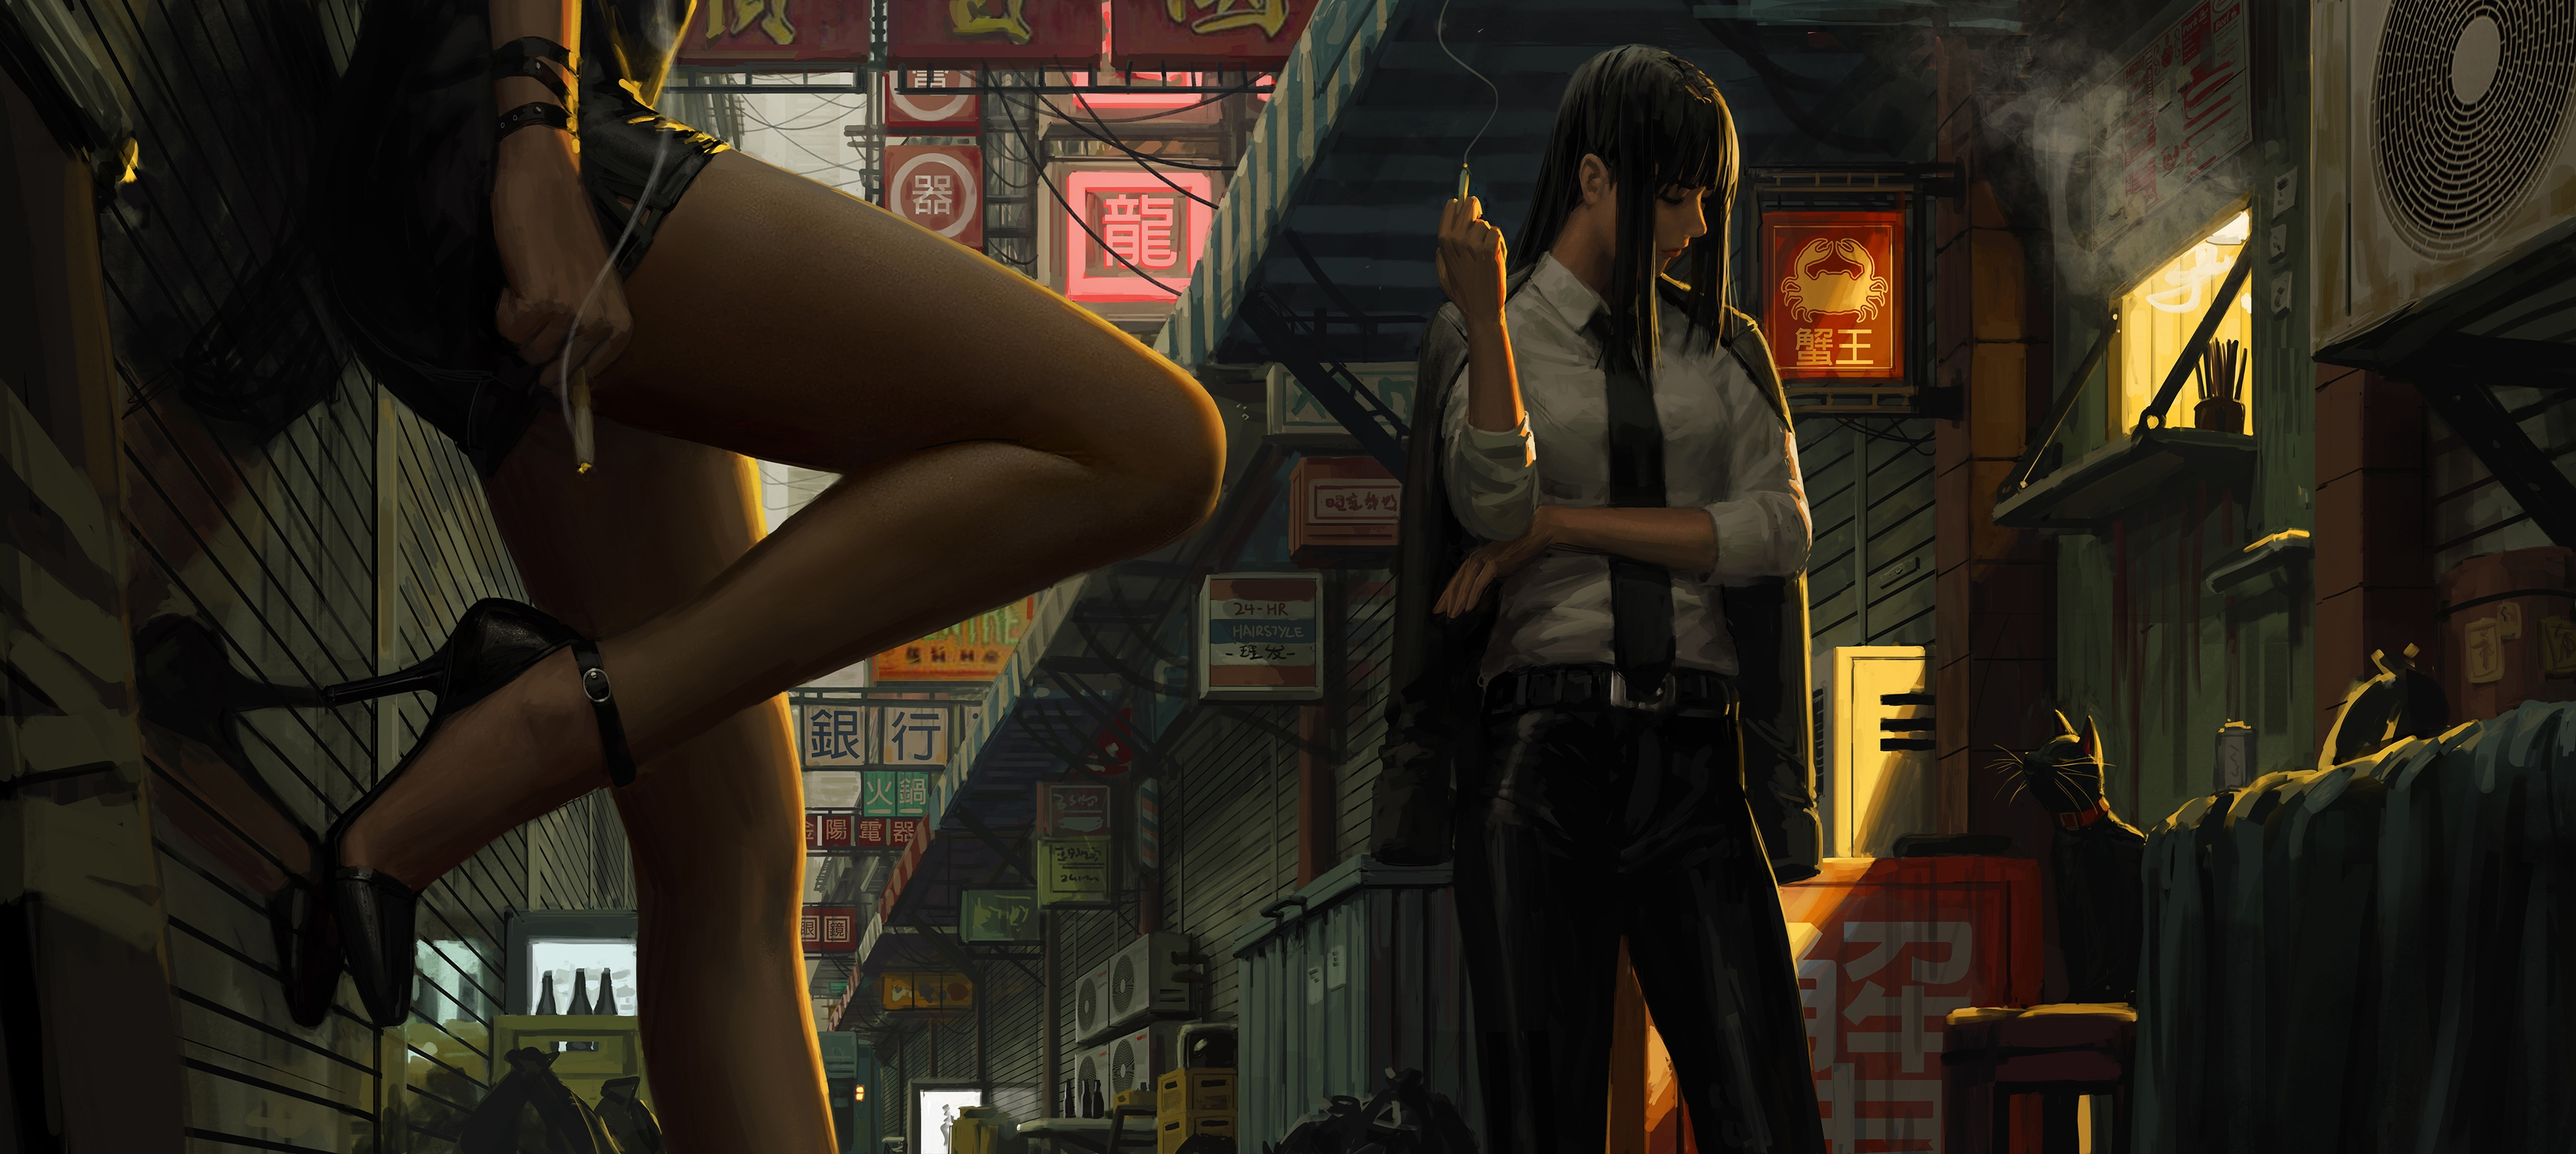 General 3794x1700 digital art women smoking Bad guys legs artwork GUWEIZ blunt bangs black hair black heels black minidress thighs 2D